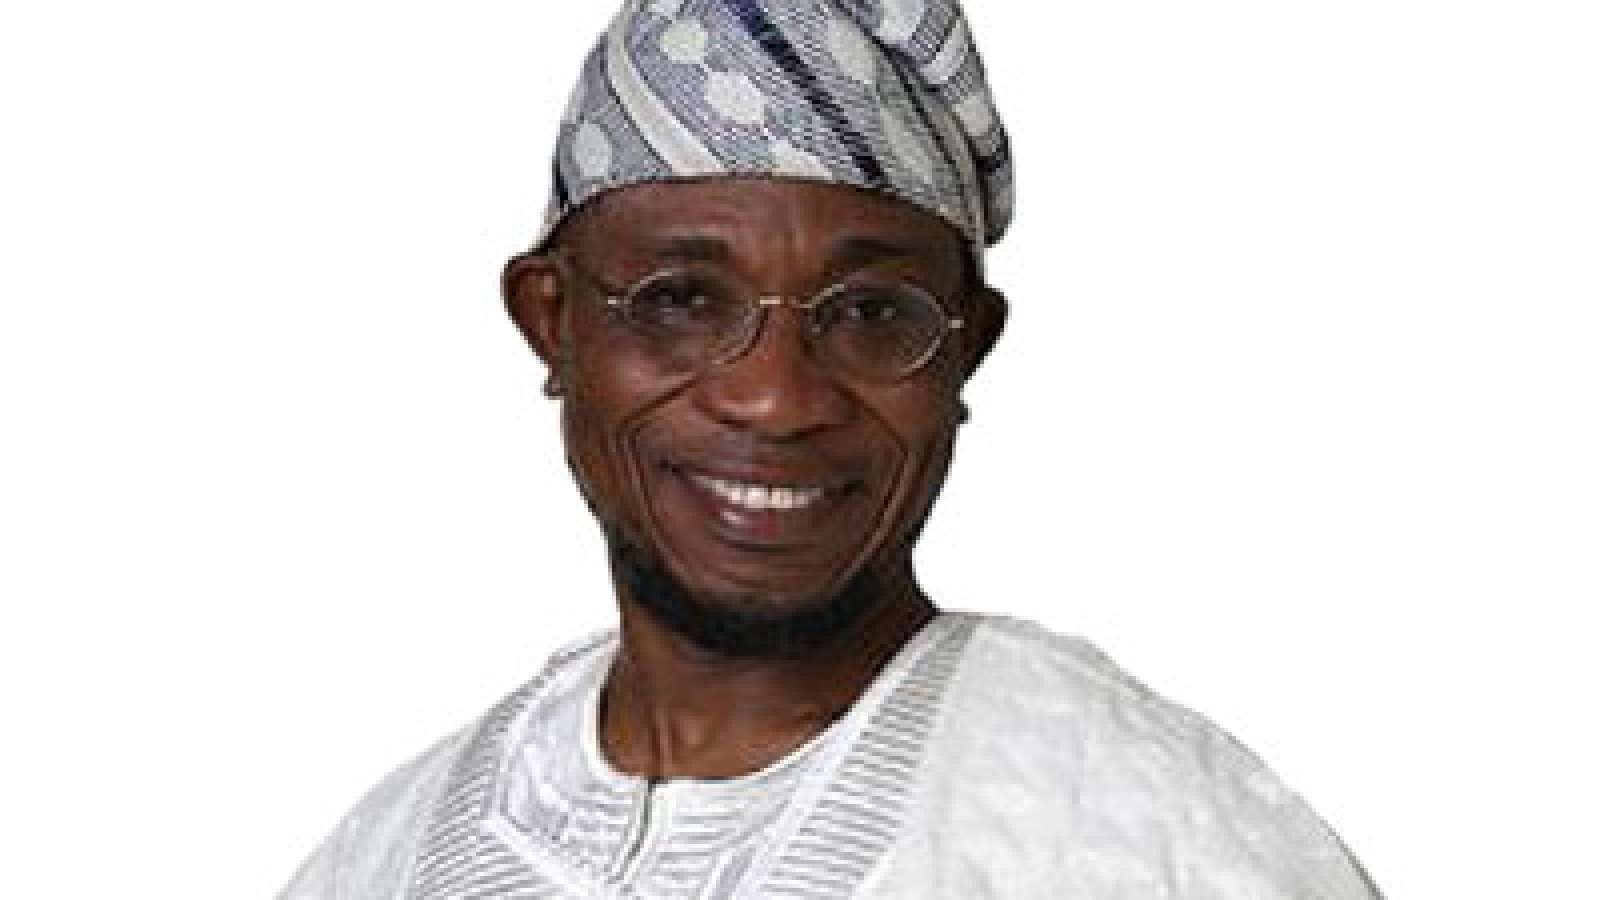 Ogbeni-Rauf-Adesoji-Aregbesola-Governor-of-Osun-state